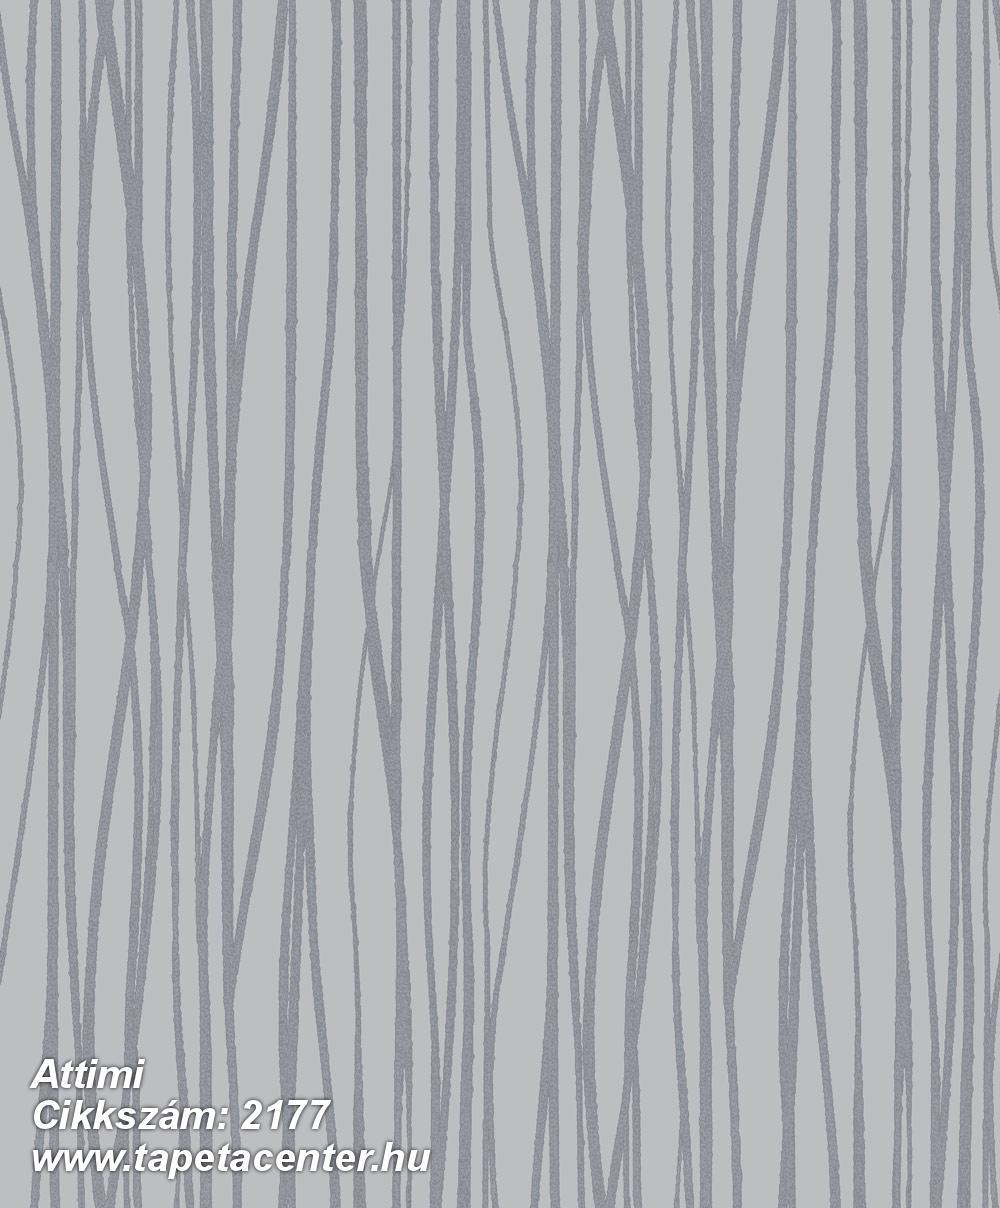 Attimi - 2177 Olasz tapéta